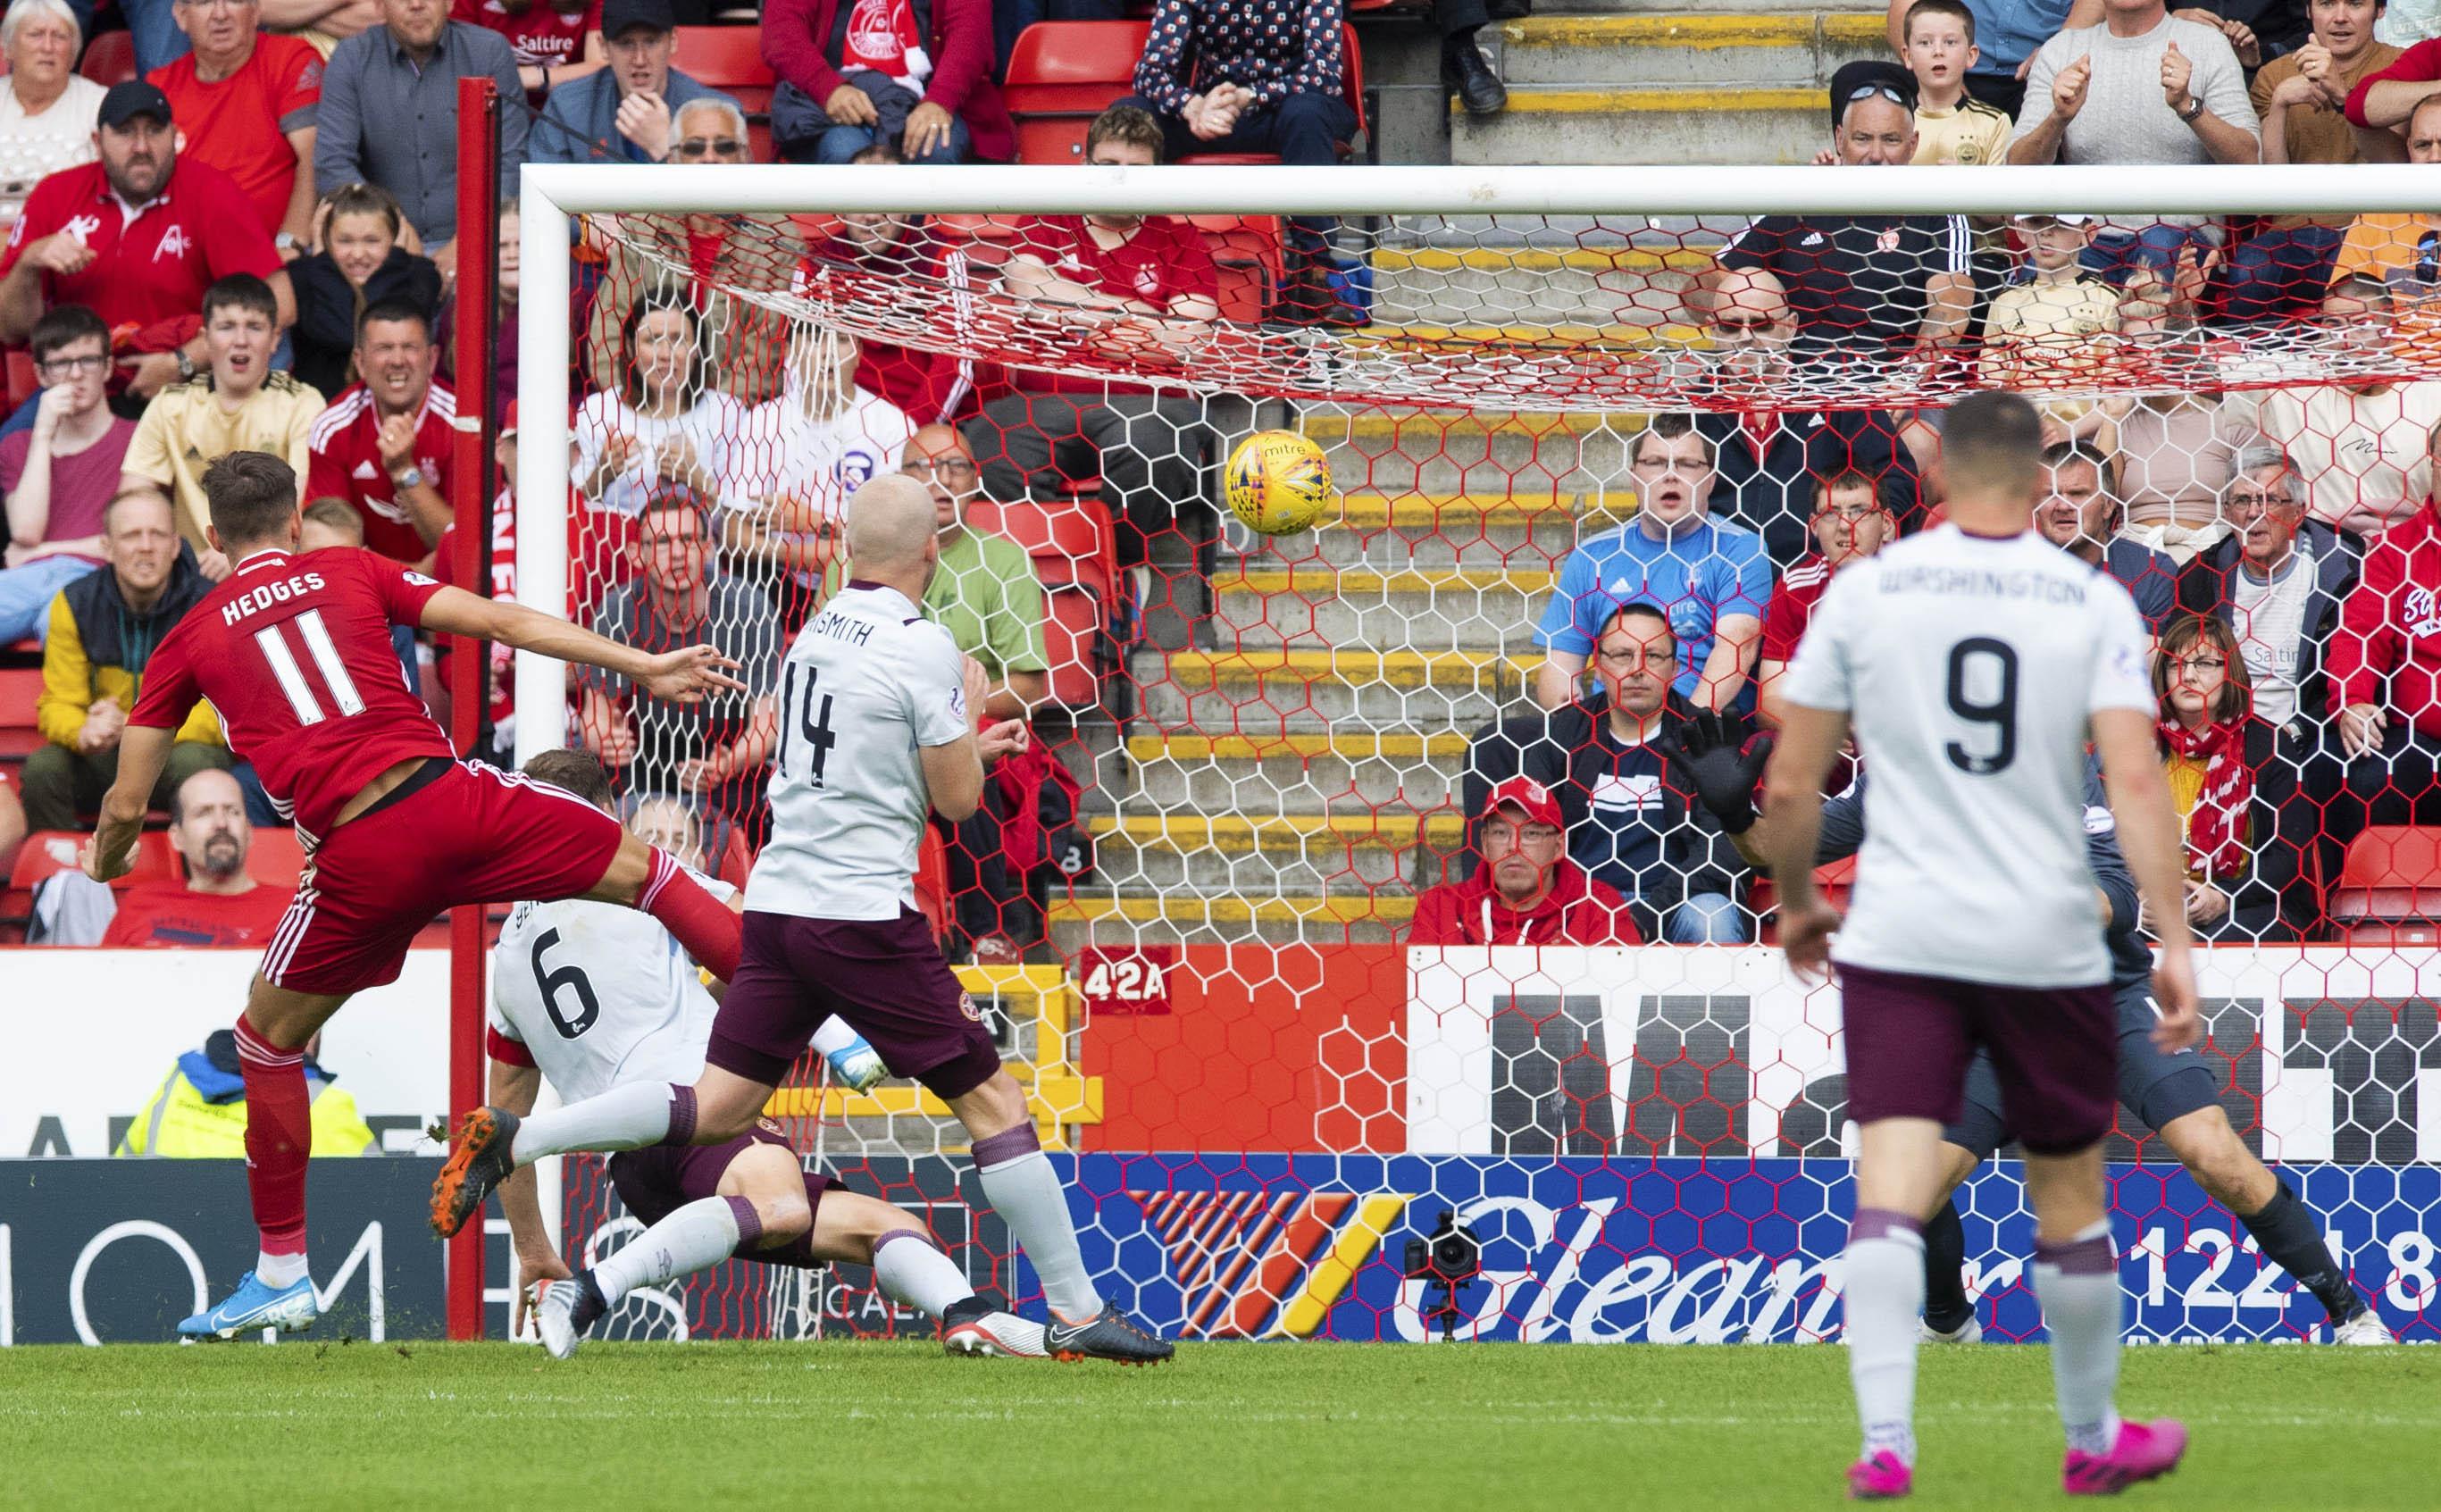 Ryan Hedges strikes to make it 3-2 to Aberdeen.